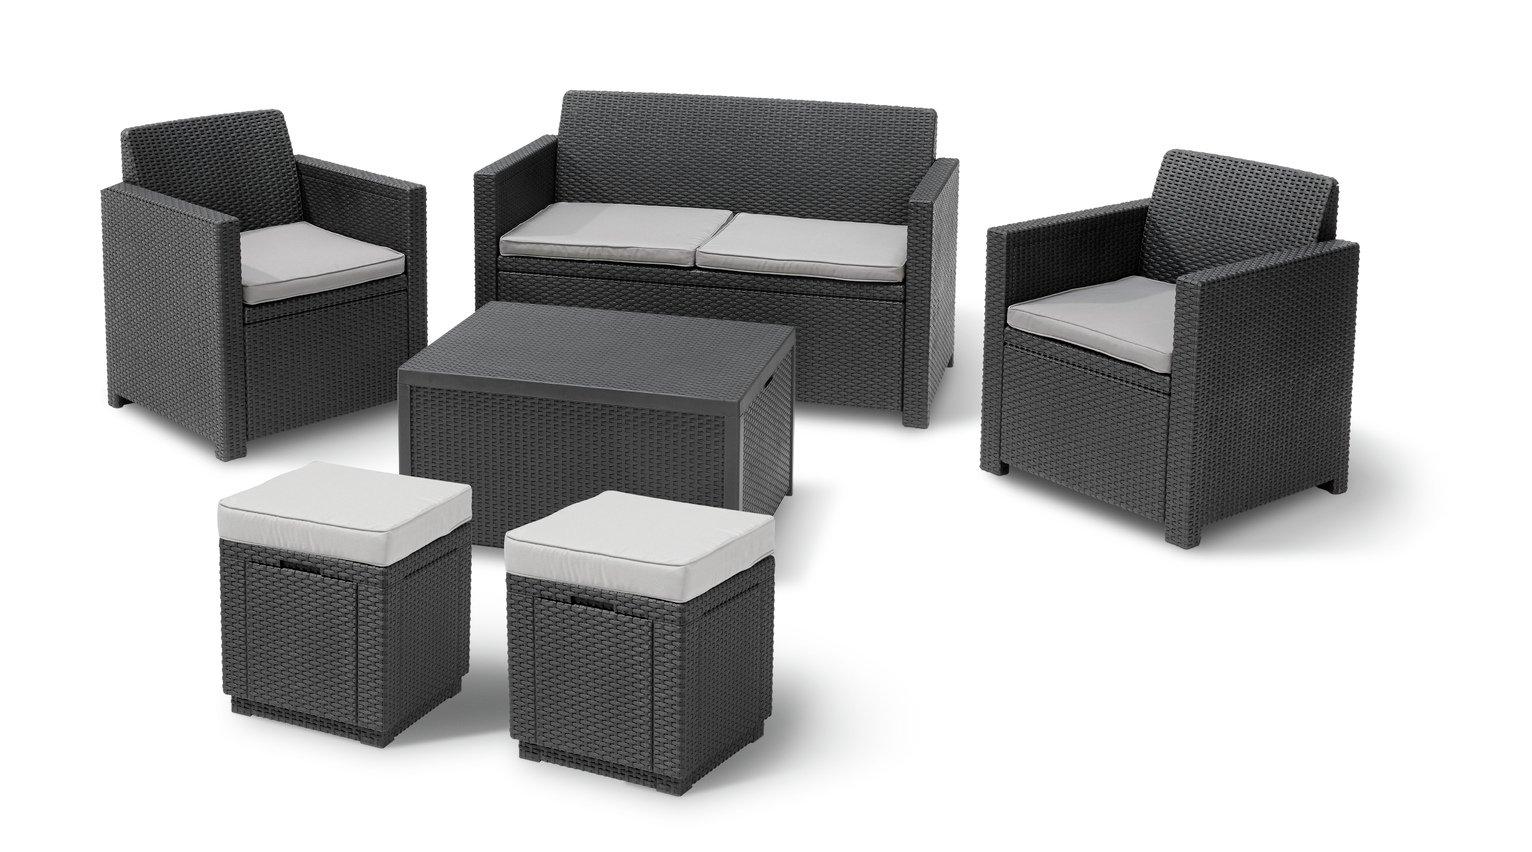 Keter Merano 6 Seater Rattan Effect Sofa Set With Storage